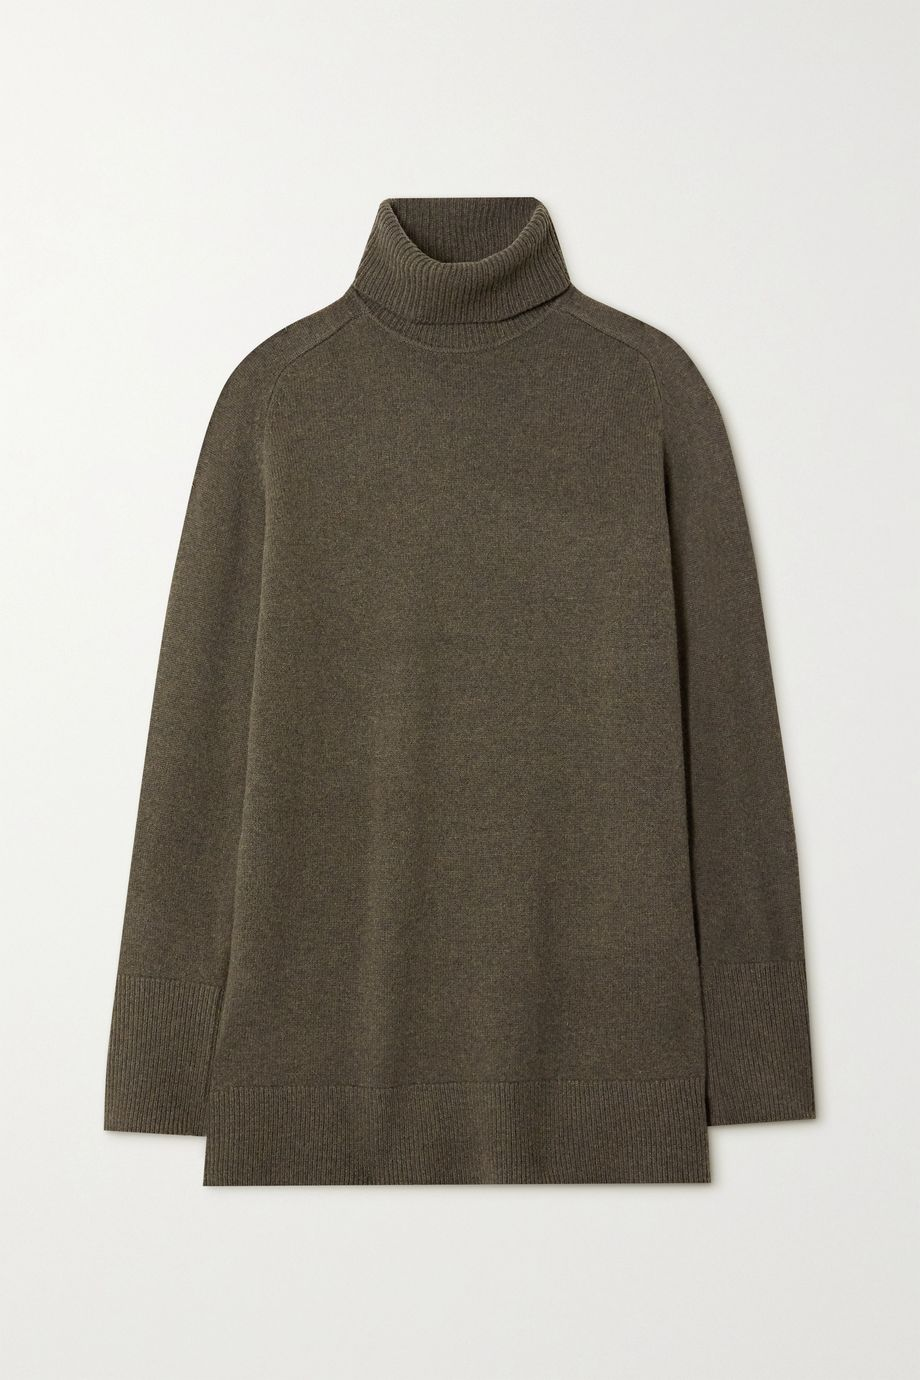 Joseph 羊毛高领毛衣